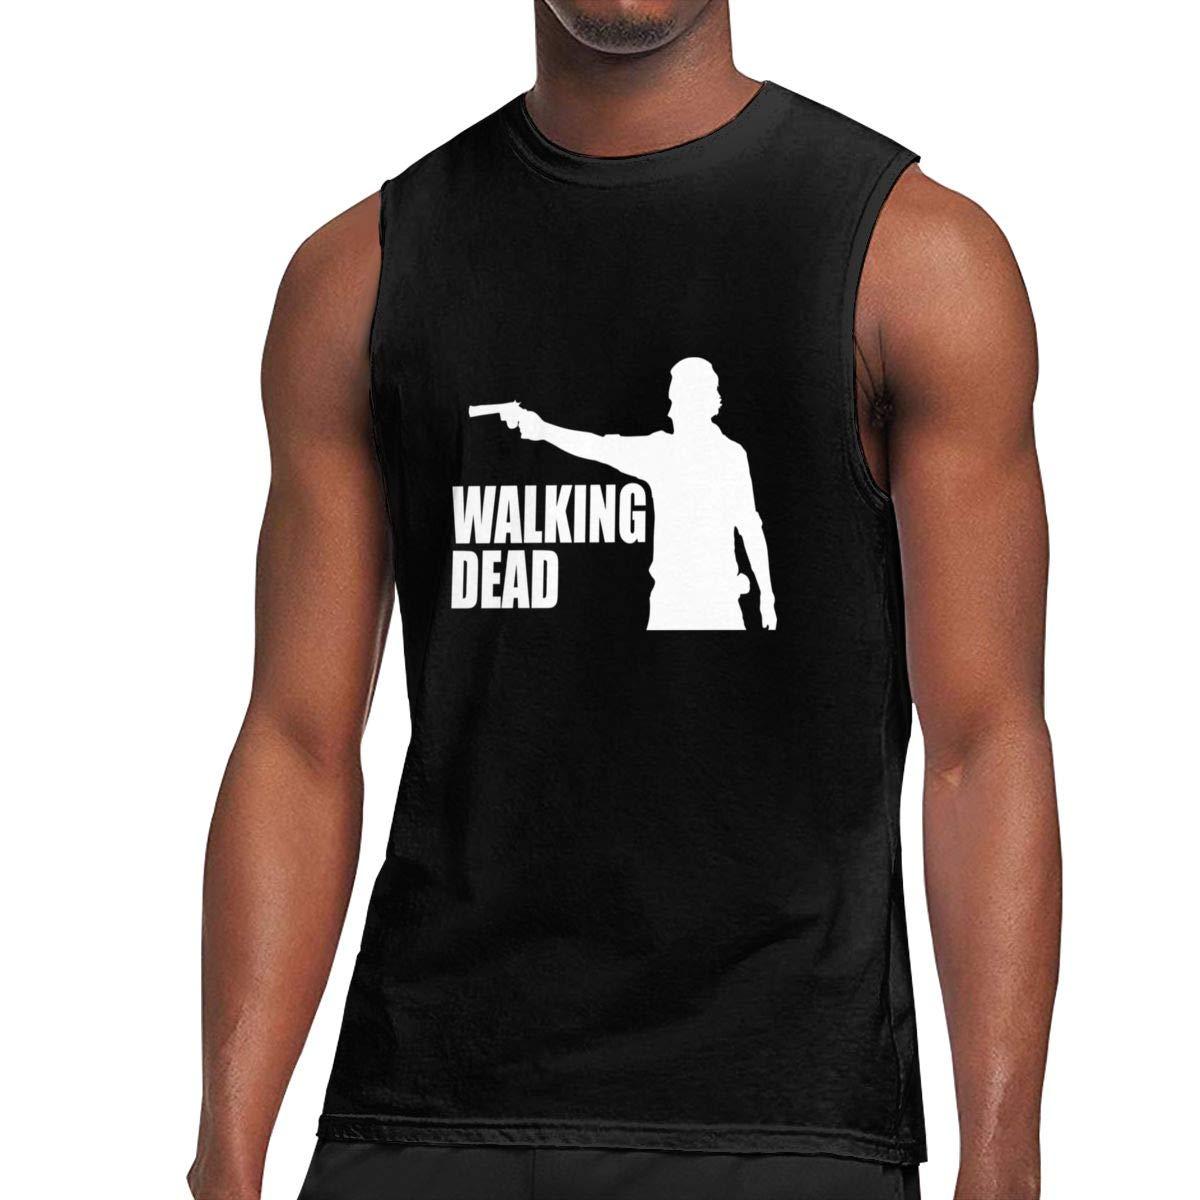 Seuriamin The Walking Dead Fashion Jogging Sleeveless Muscle Short Sleeve T Shirts